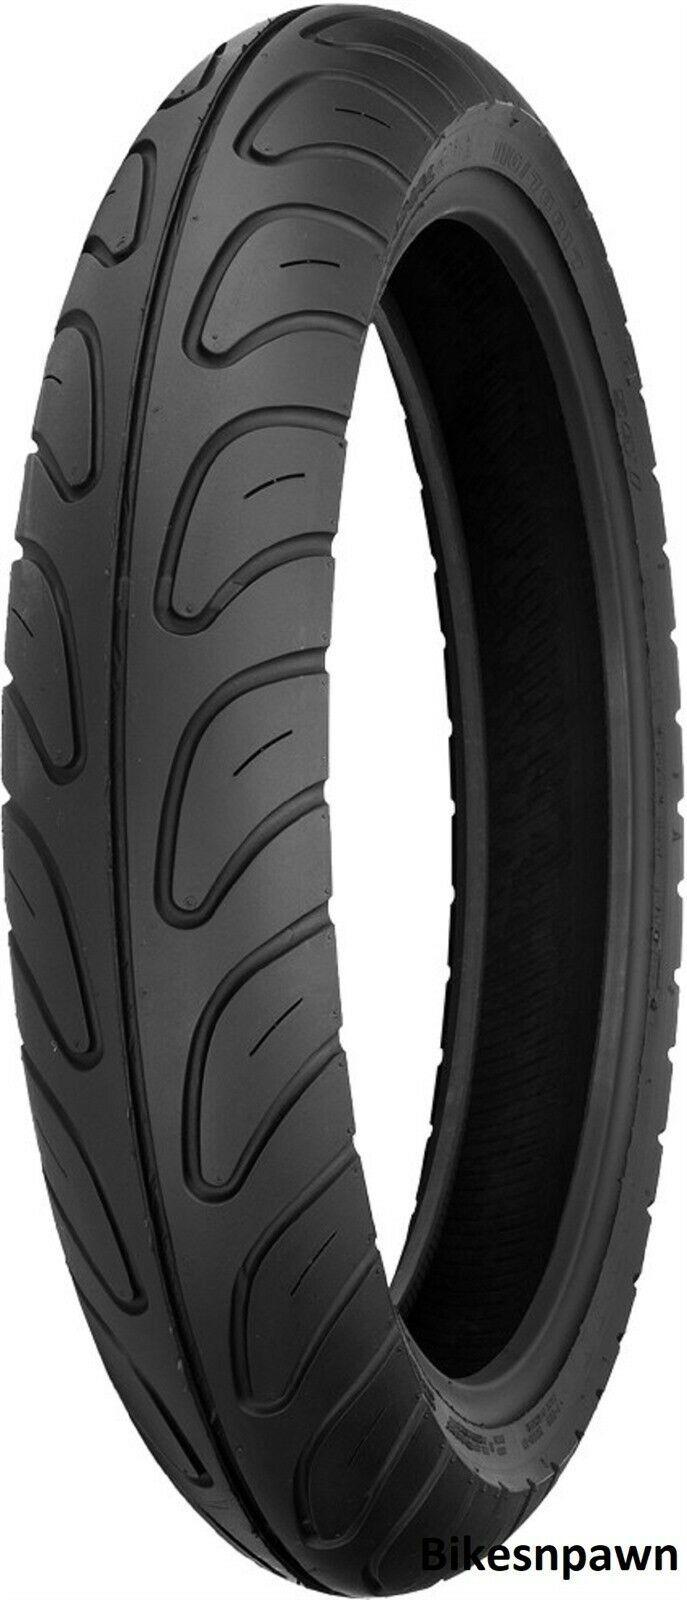 New Shinko 006 Podium Radial 130/70ZR16 Front Motorcycle Performance Tire 61W